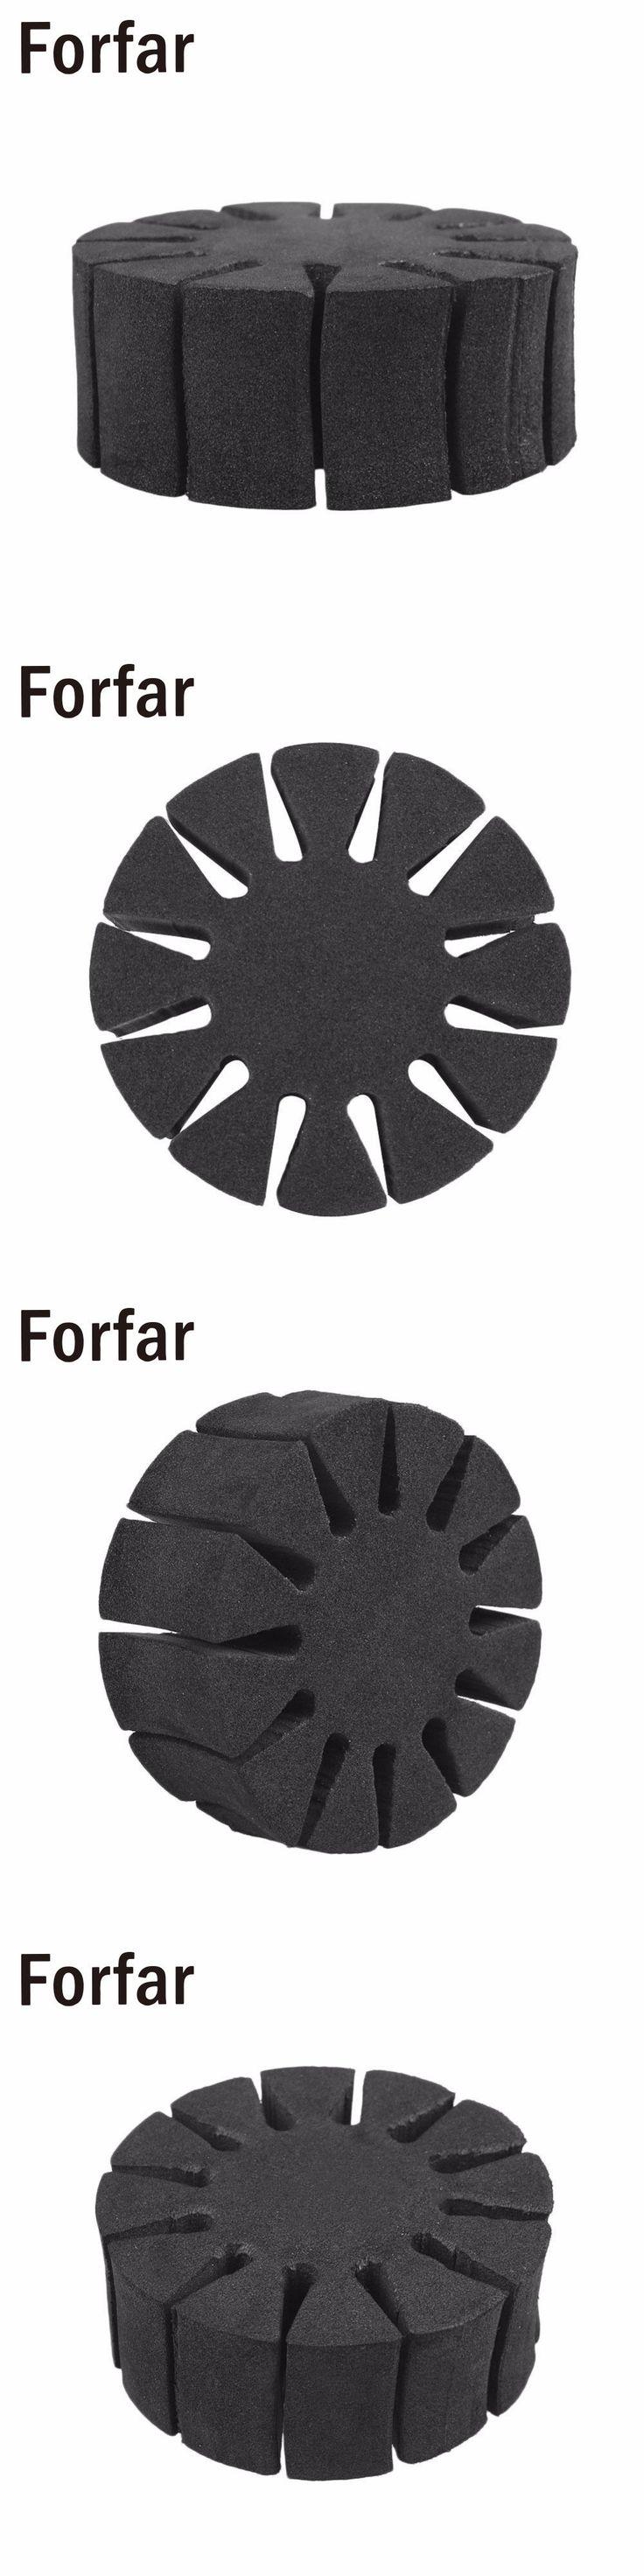 Fofar12PCS shots Arrows Archery Separator Detached Sponge Arrow Rack EVA Shooting Supplies Accessory Black Sports Accessories